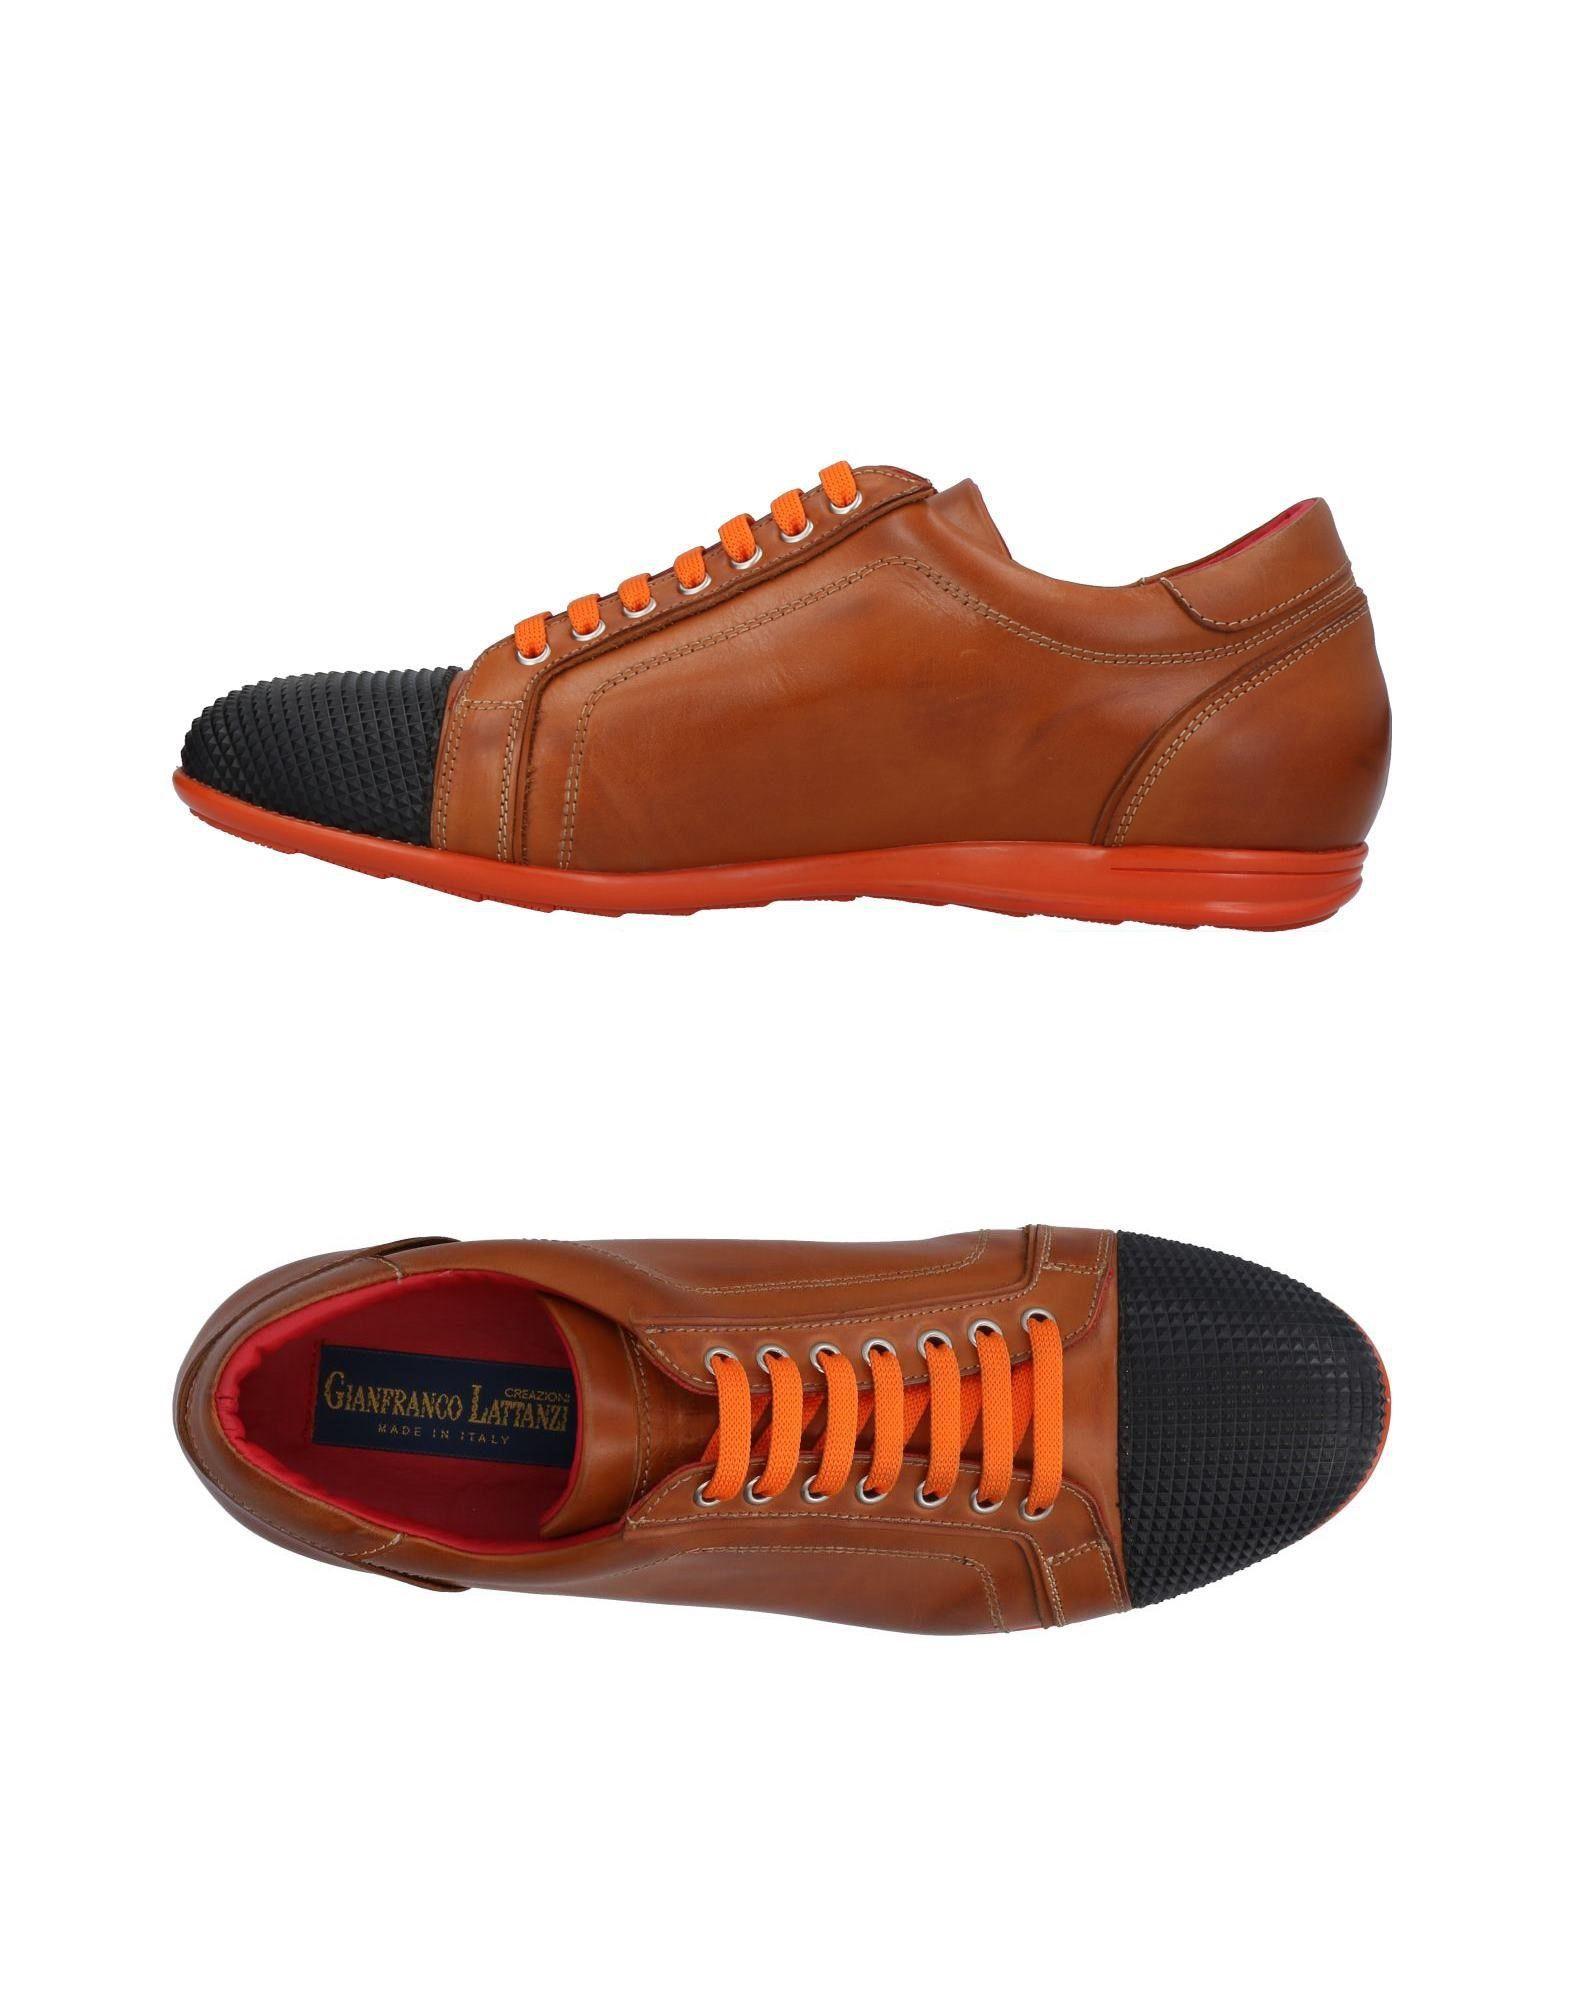 Sneakers Gianfranco Lattanzi Homme - Sneakers Gianfranco Lattanzi  Cuir Super rabais